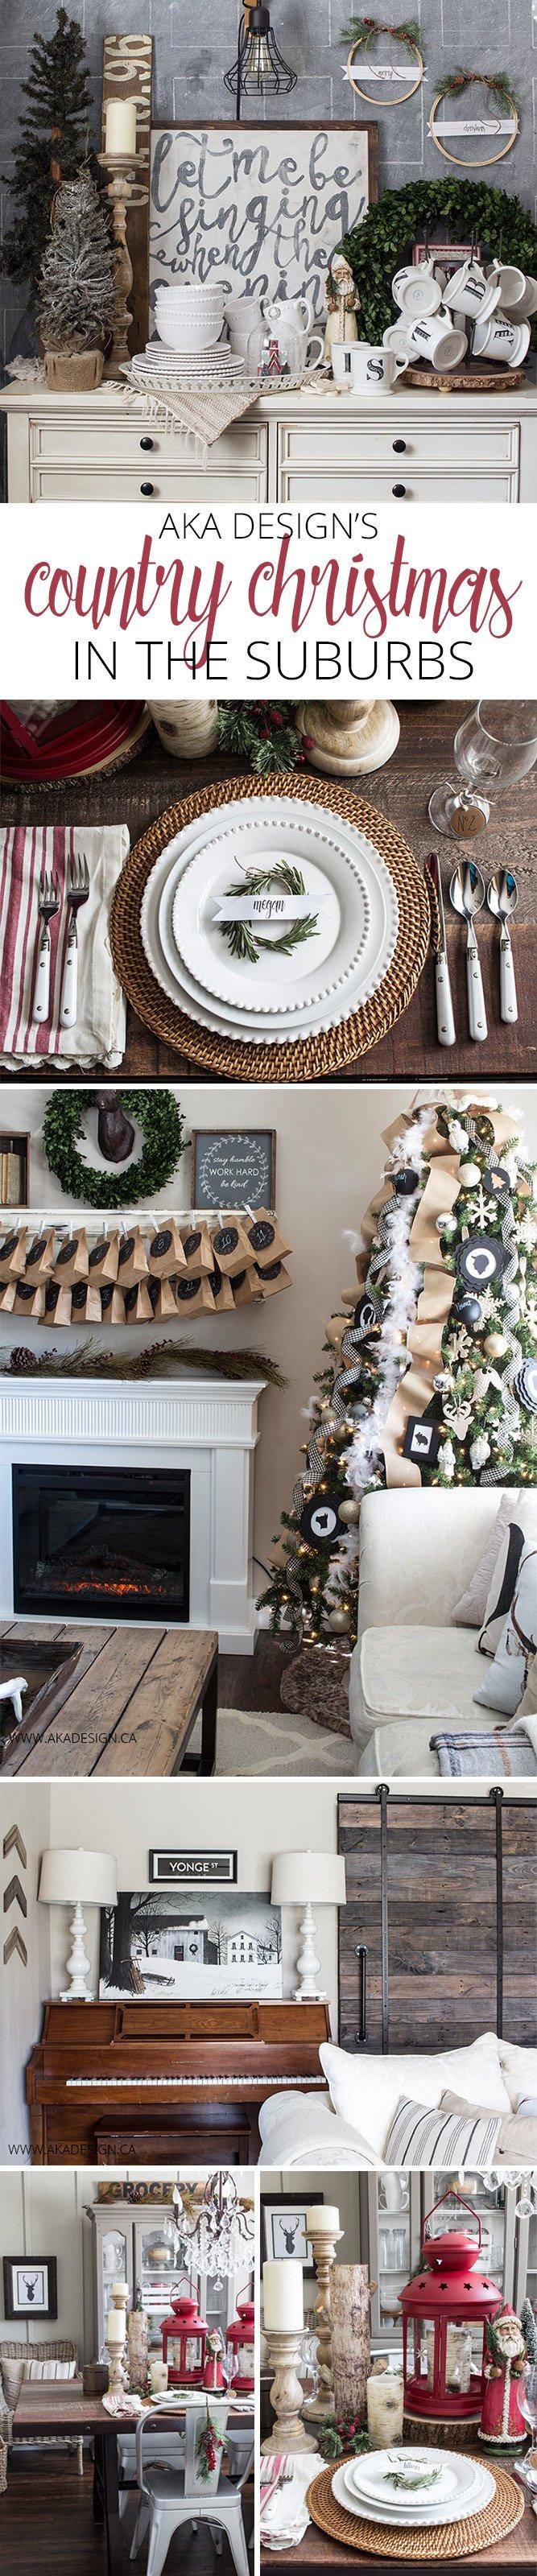 AKA Design Country Christmas Home Tour